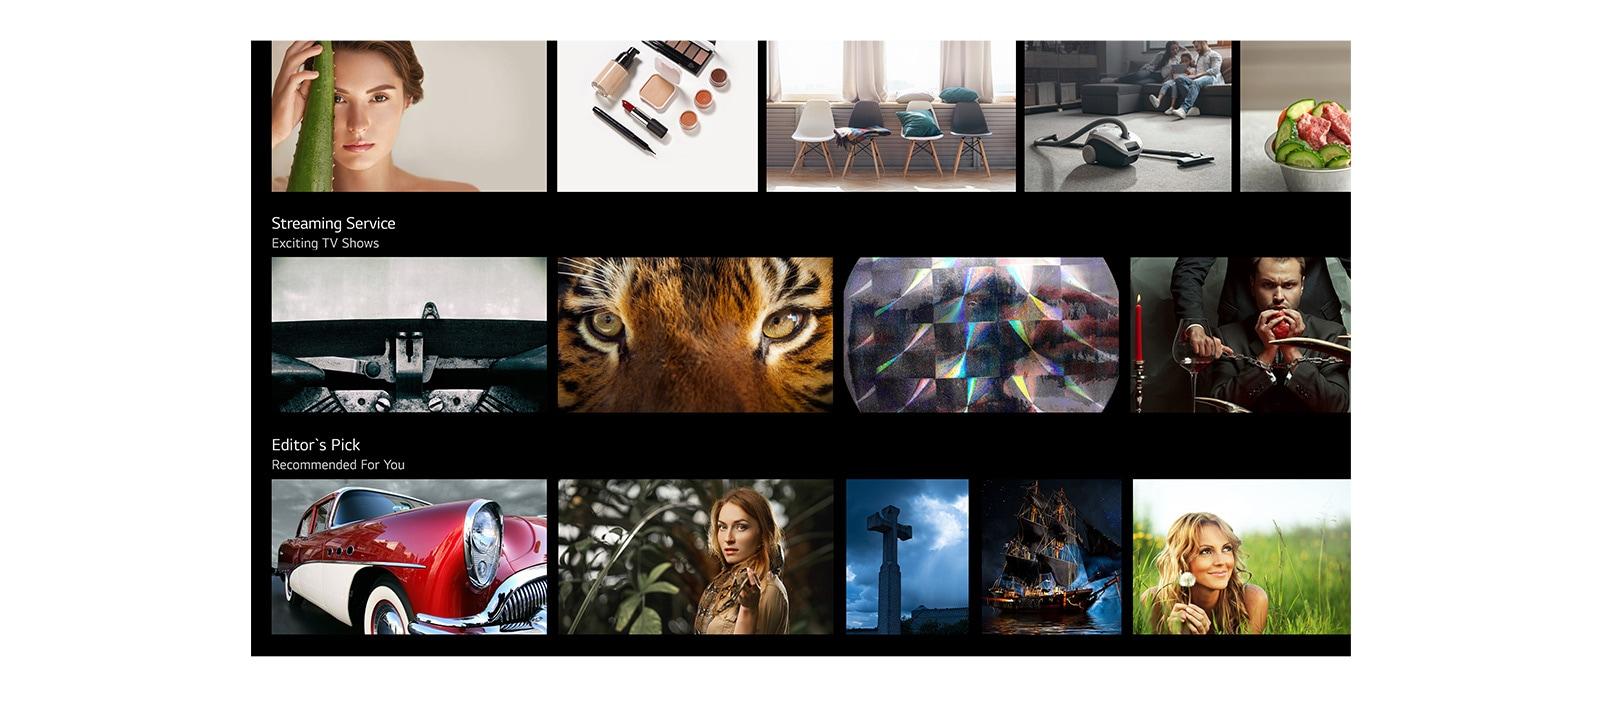 Экран телевизора, на котором показан контент, рекомендованный технологией LG ThinQ AI.